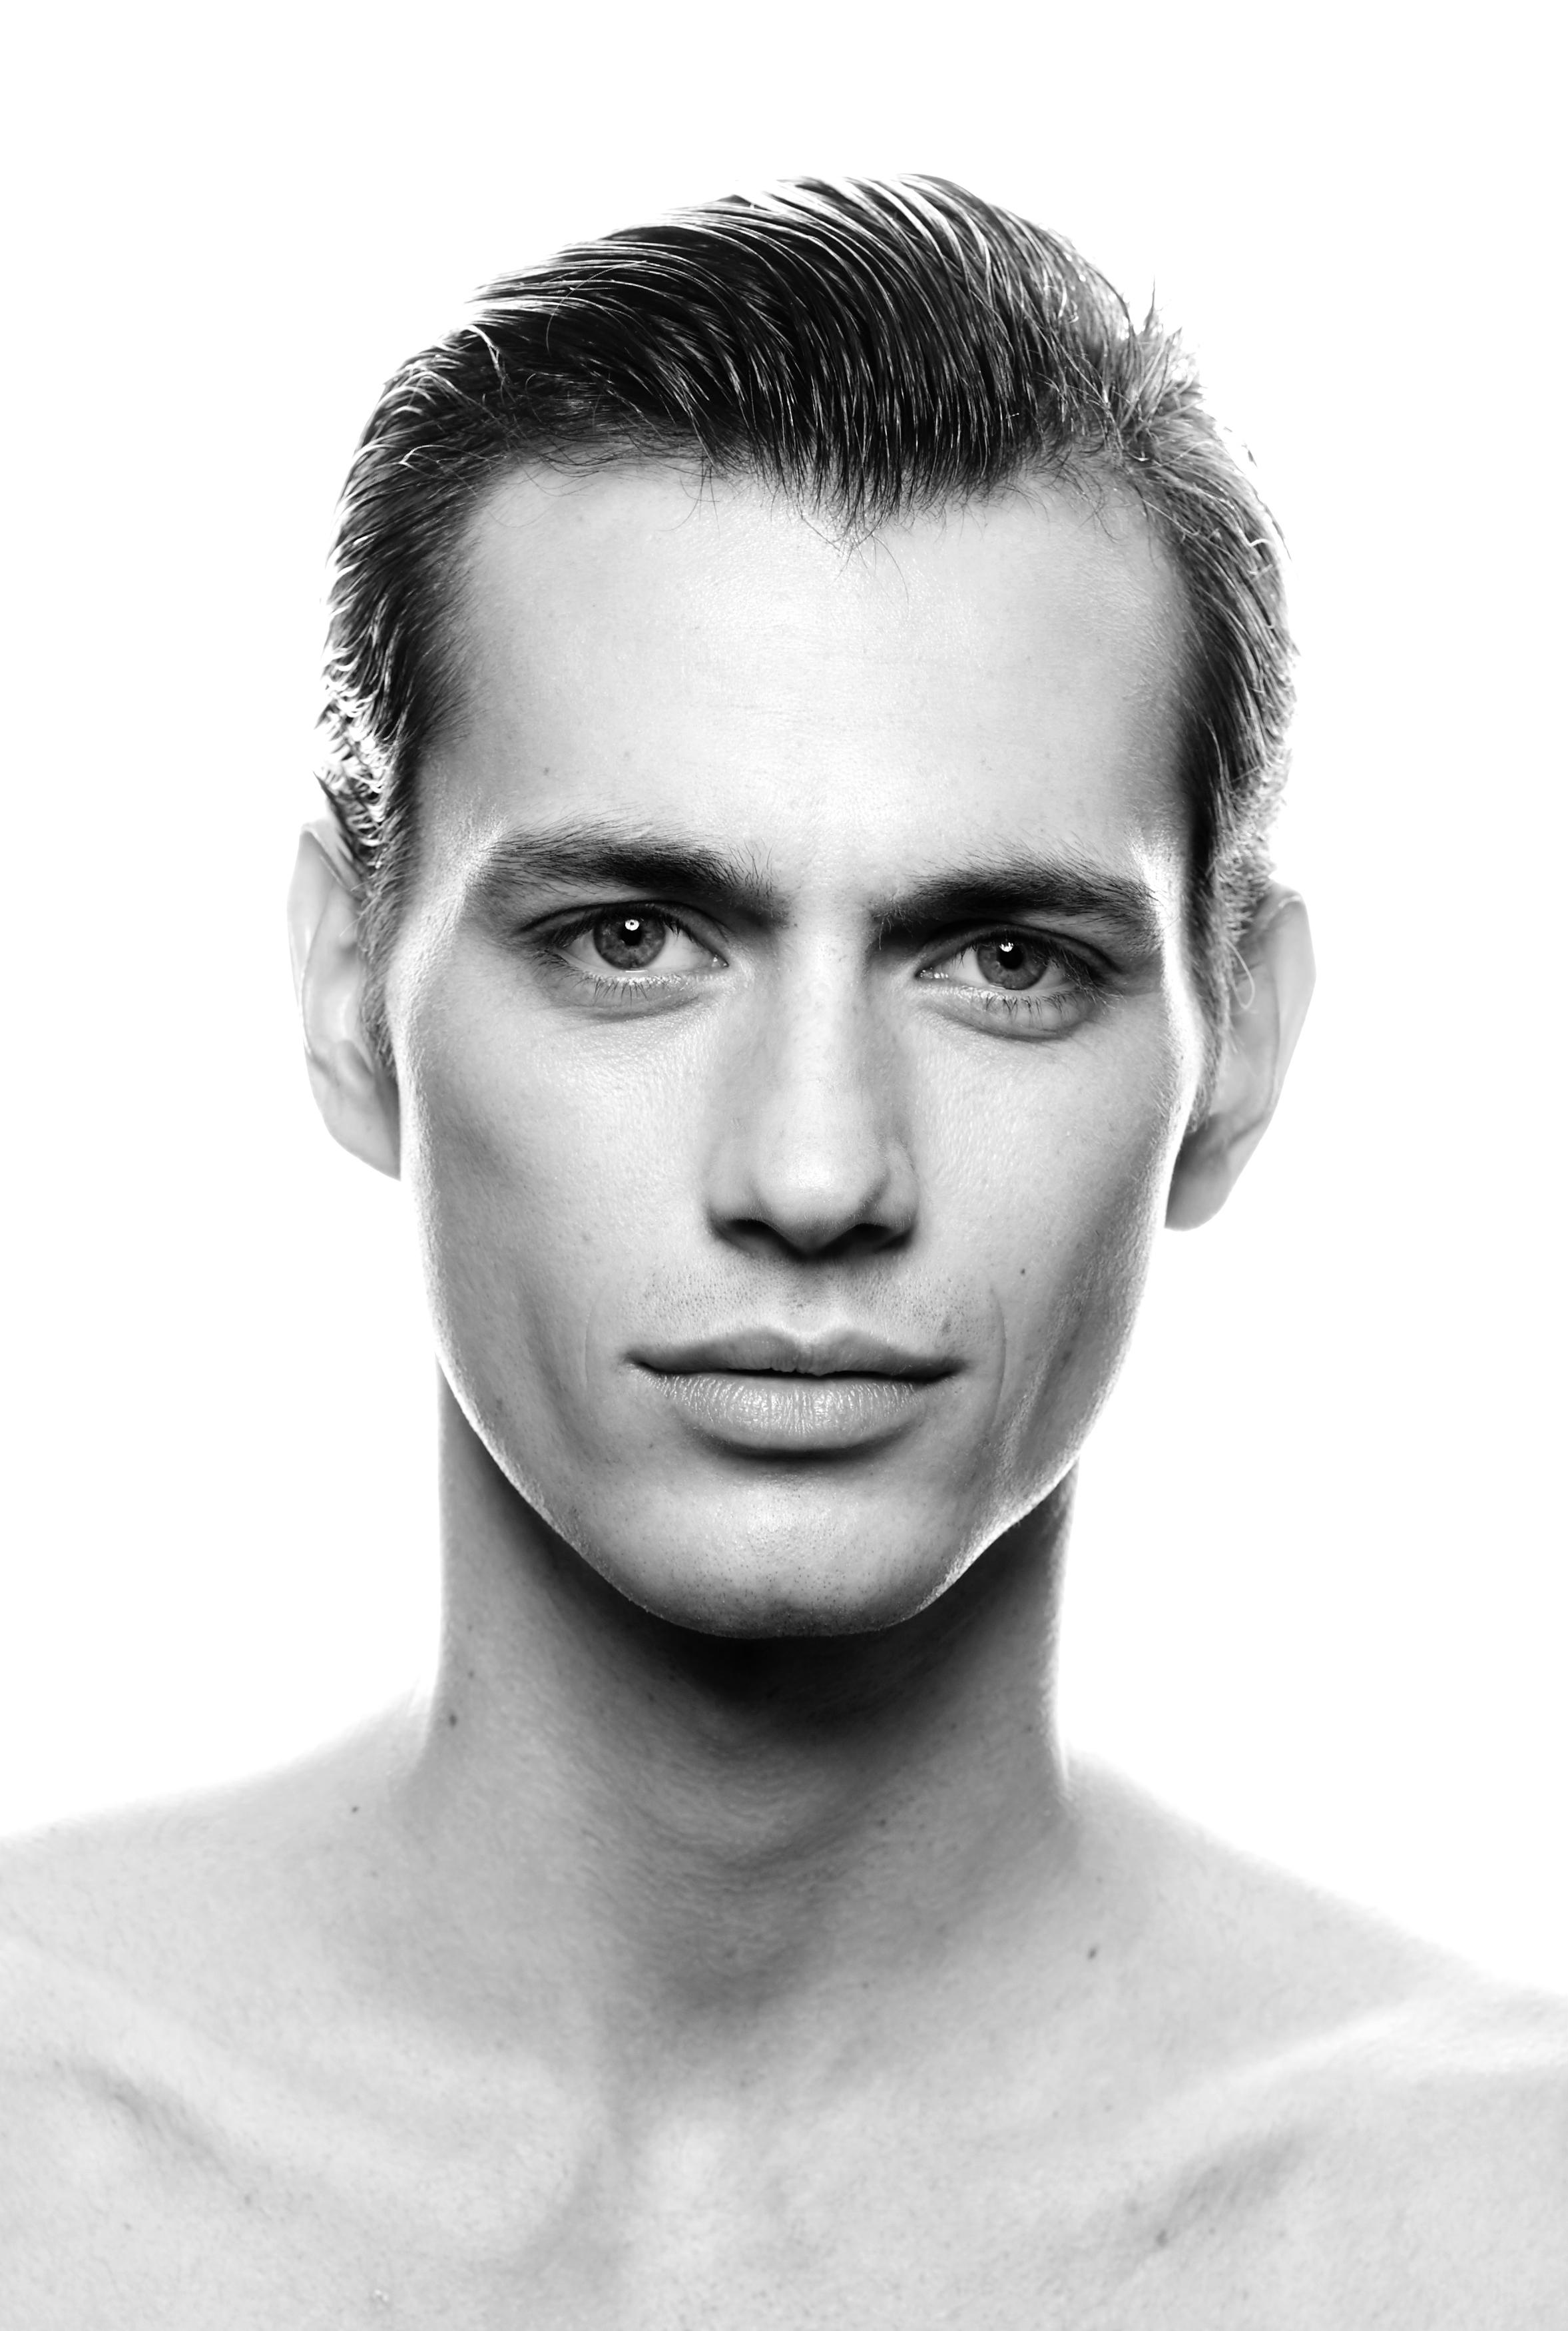 Dramatic Black And White Portraits • Bailward Photography